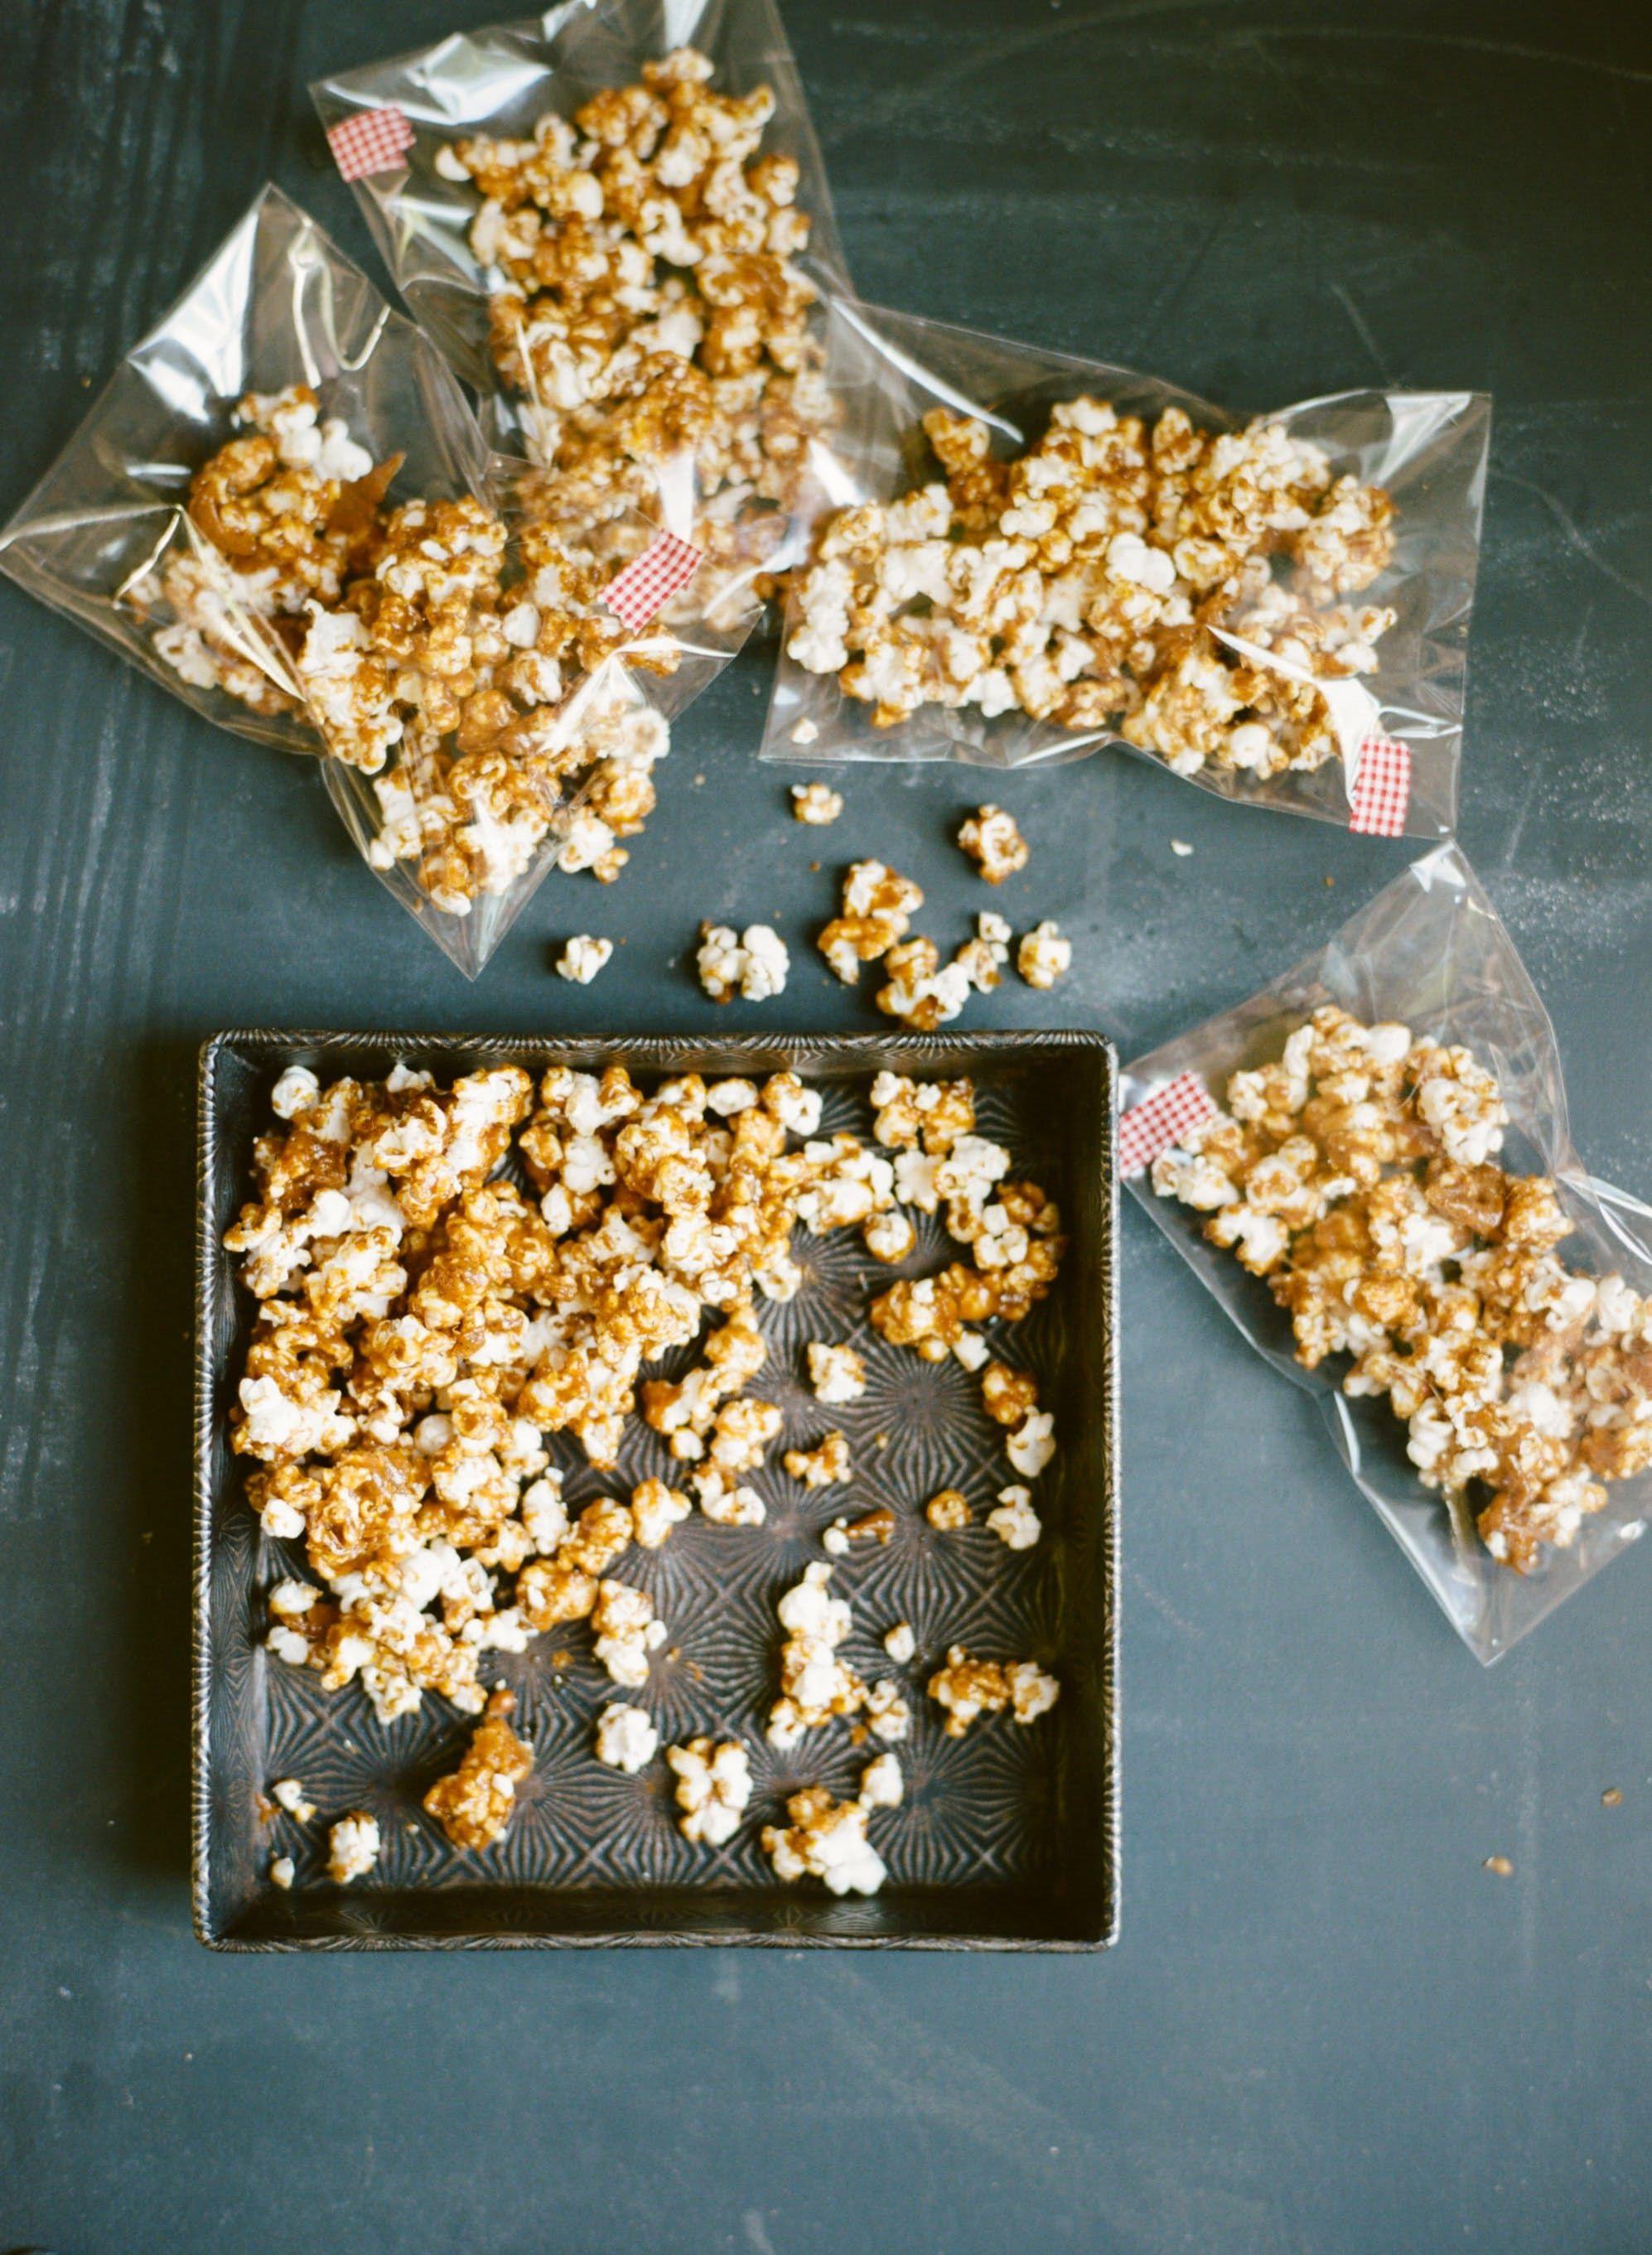 Smoky Candied Popcorn